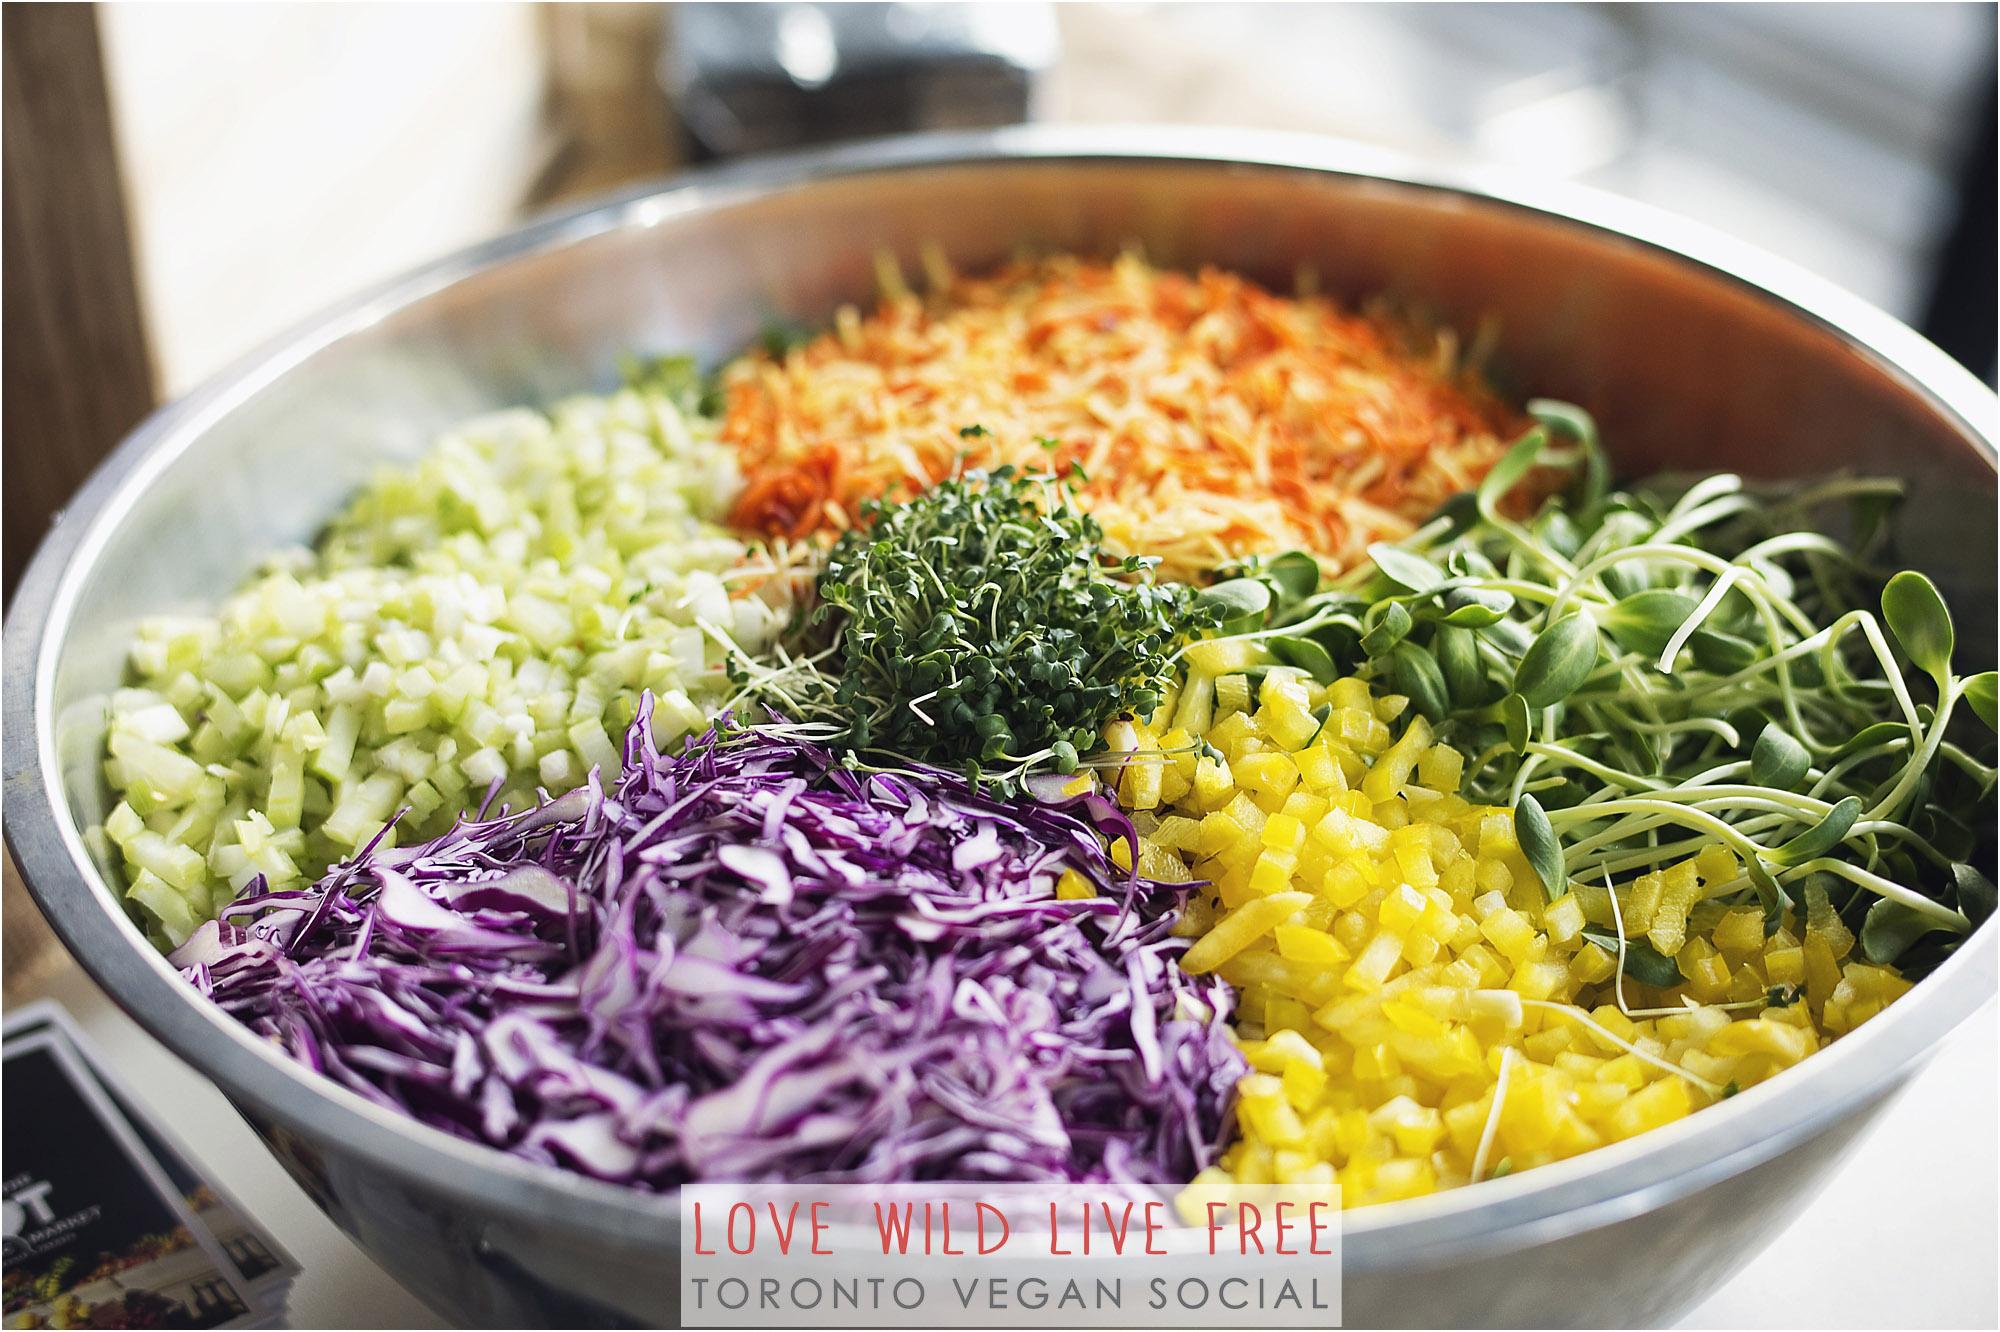 Salads and dressings by RawFoodz